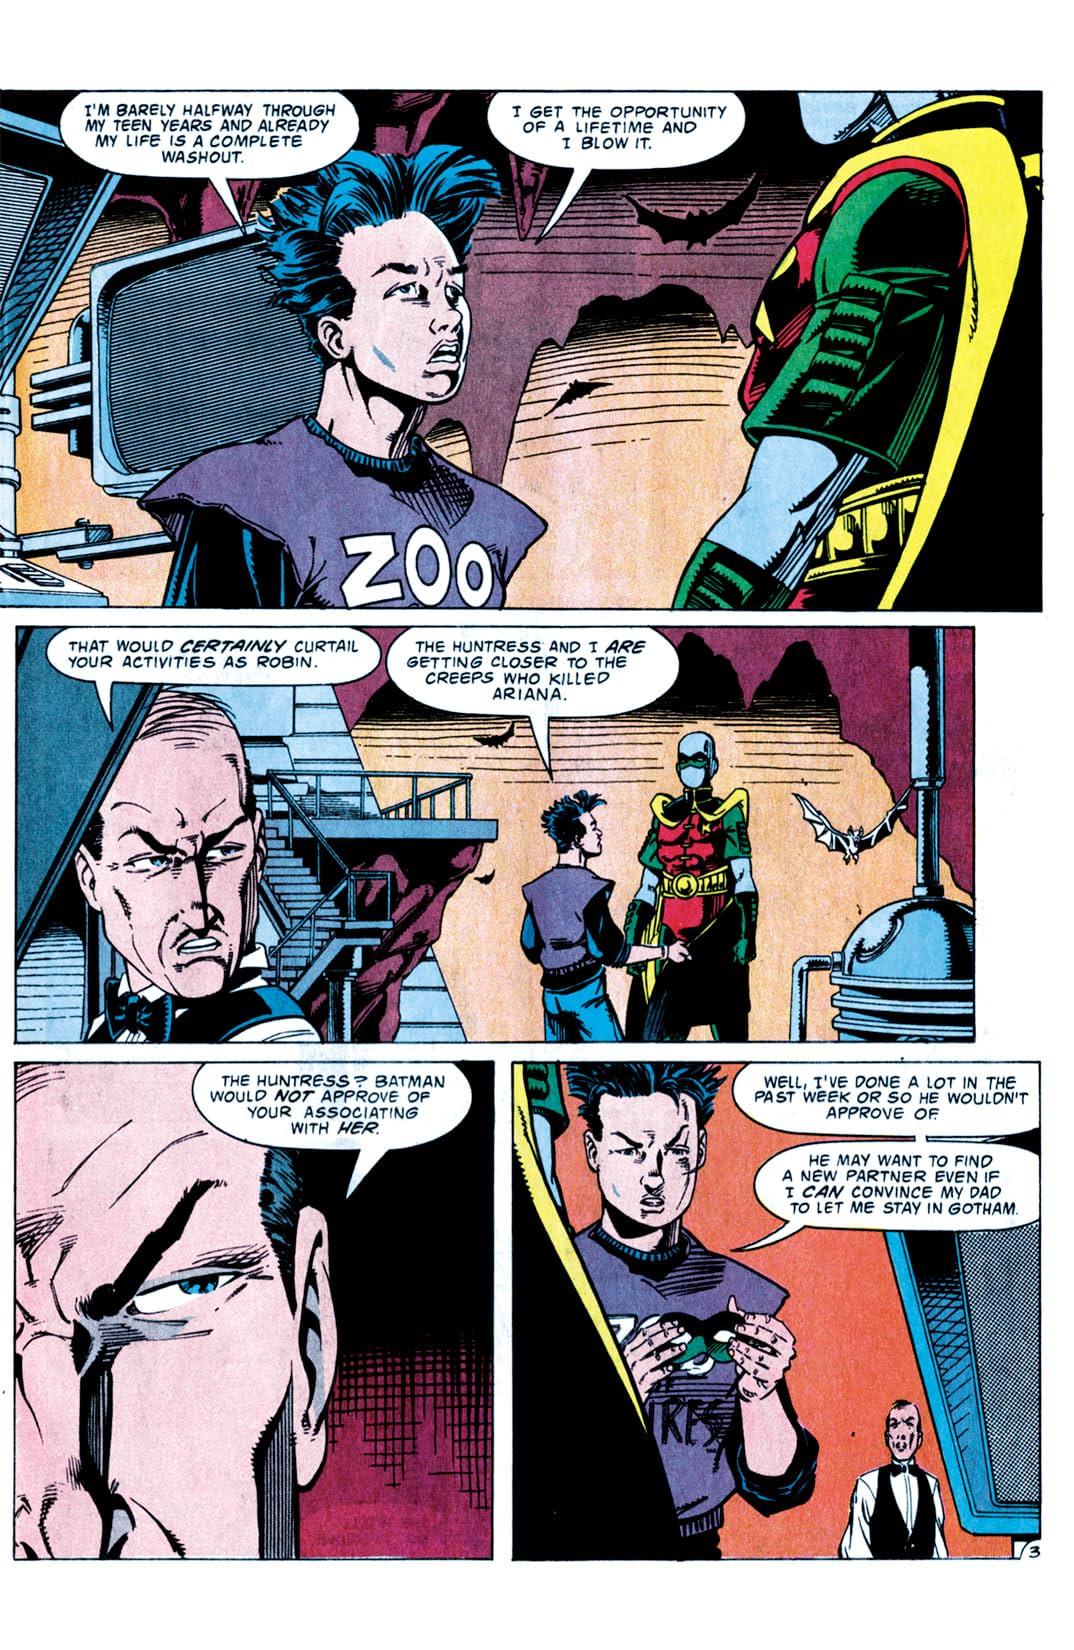 Robin III: Cry of the Huntress #5 (of 6)